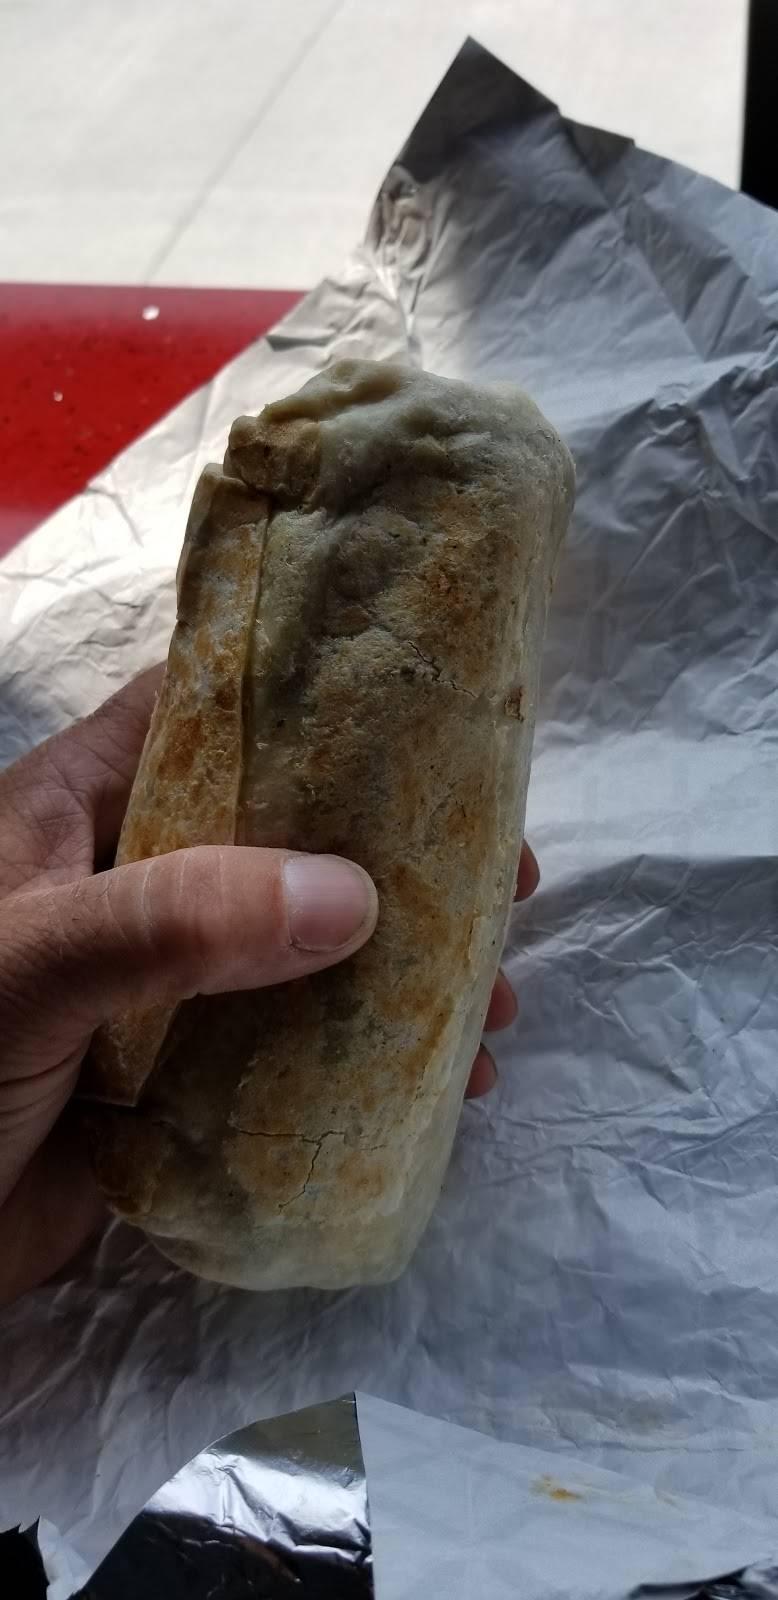 Fat Bastard Burrito Co. | restaurant | 491 Gibb St, Oshawa, ON L1J 1Z4, Canada | 9054348888 OR +1 905-434-8888